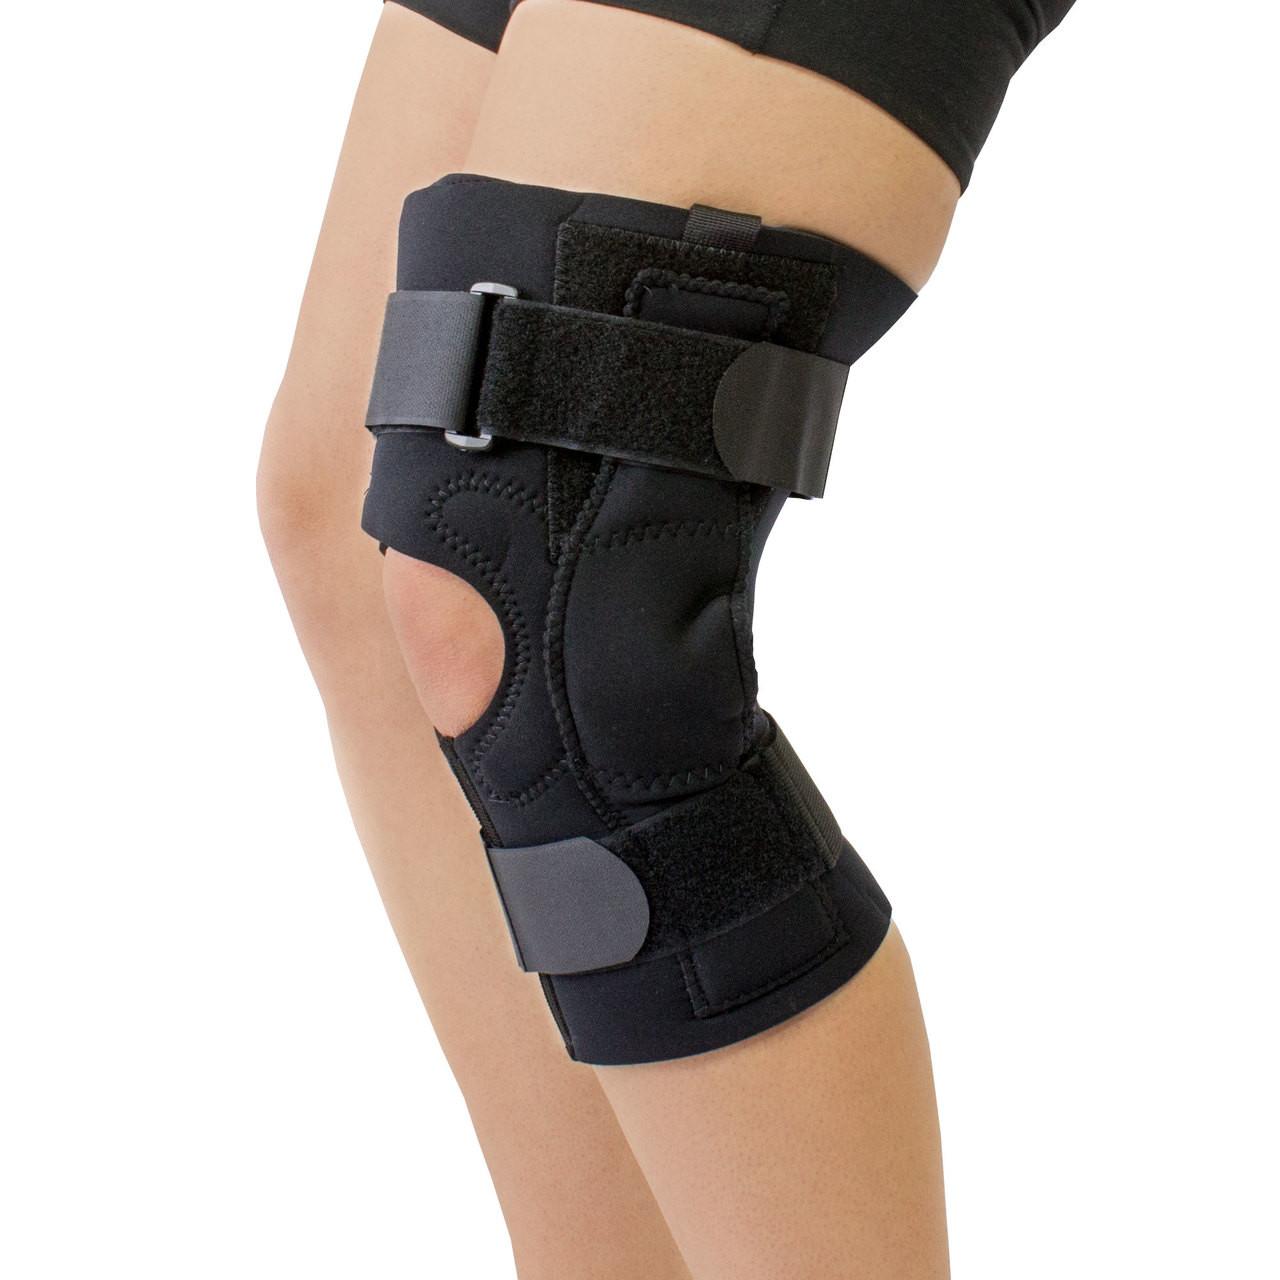 9d6e7baf2c Obesity Neoprene Knee Brace for Large Thighs Extension Control ...